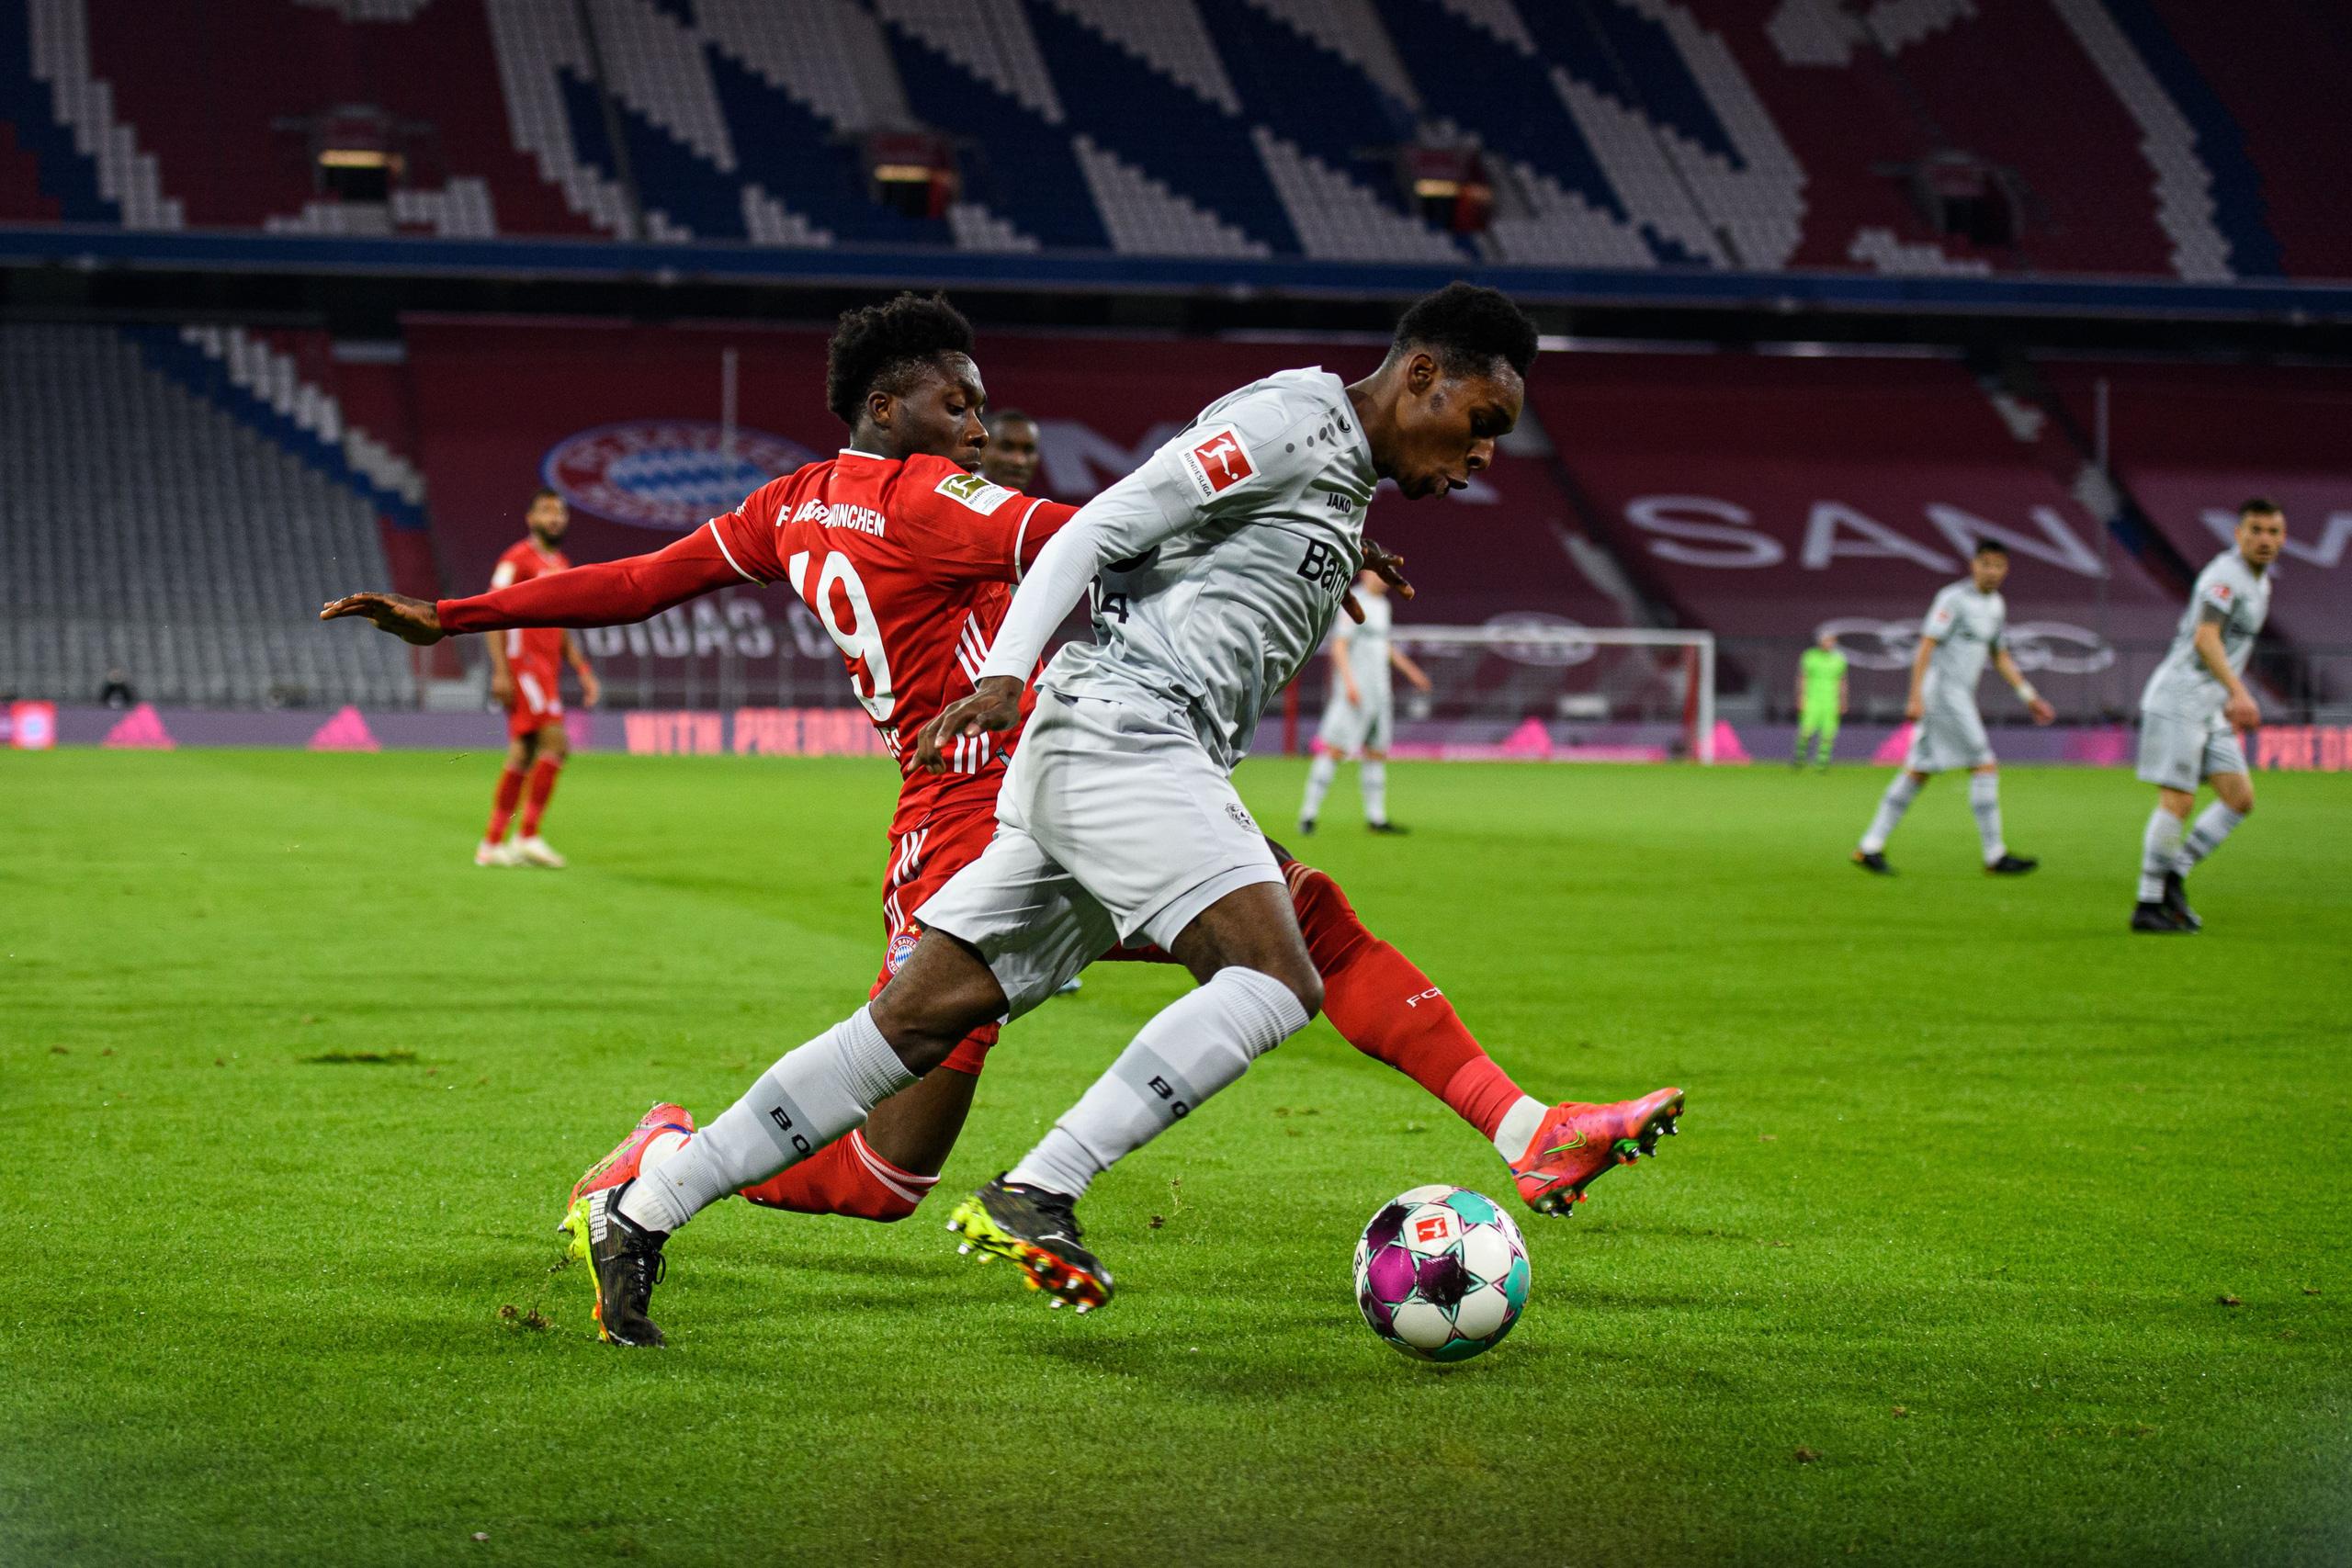 Bayern Munich băng băng về đích ở Bundesliga - Ảnh 6.